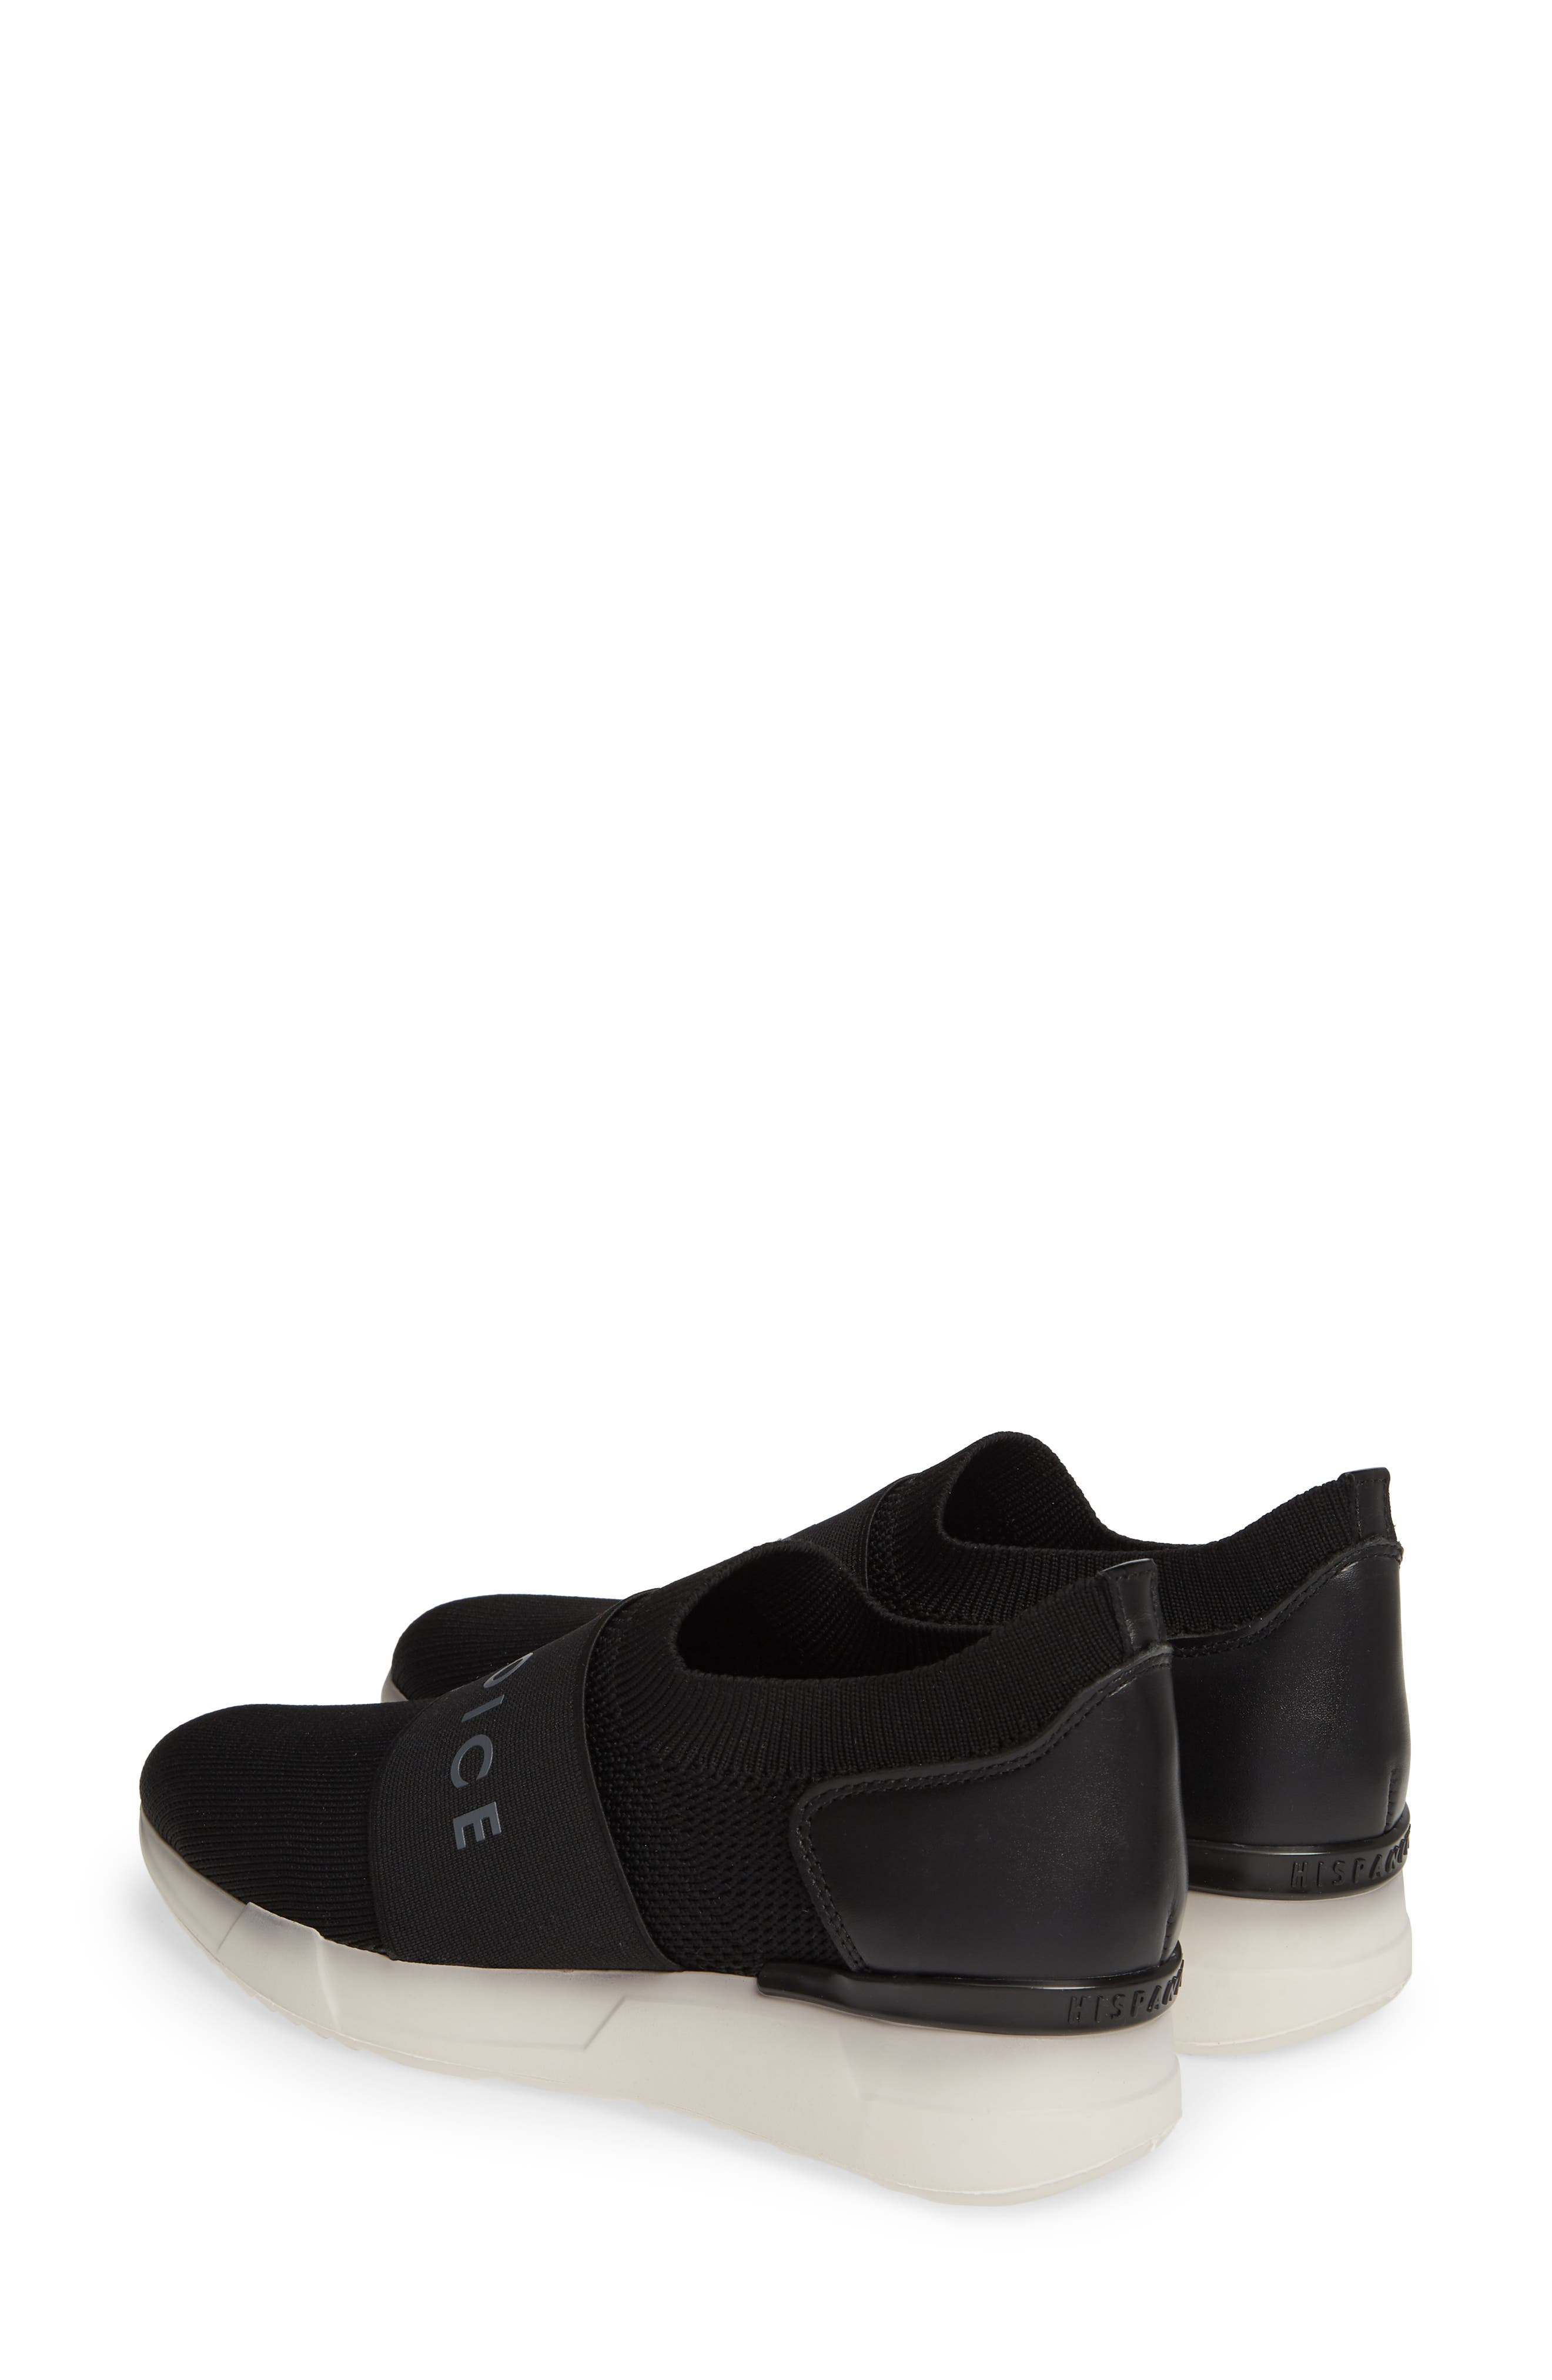 HISPANITAS, Spence Joy Is Choice Sock-Knit Sneaker, Alternate thumbnail 3, color, BLACK/ WHITE FABRIC